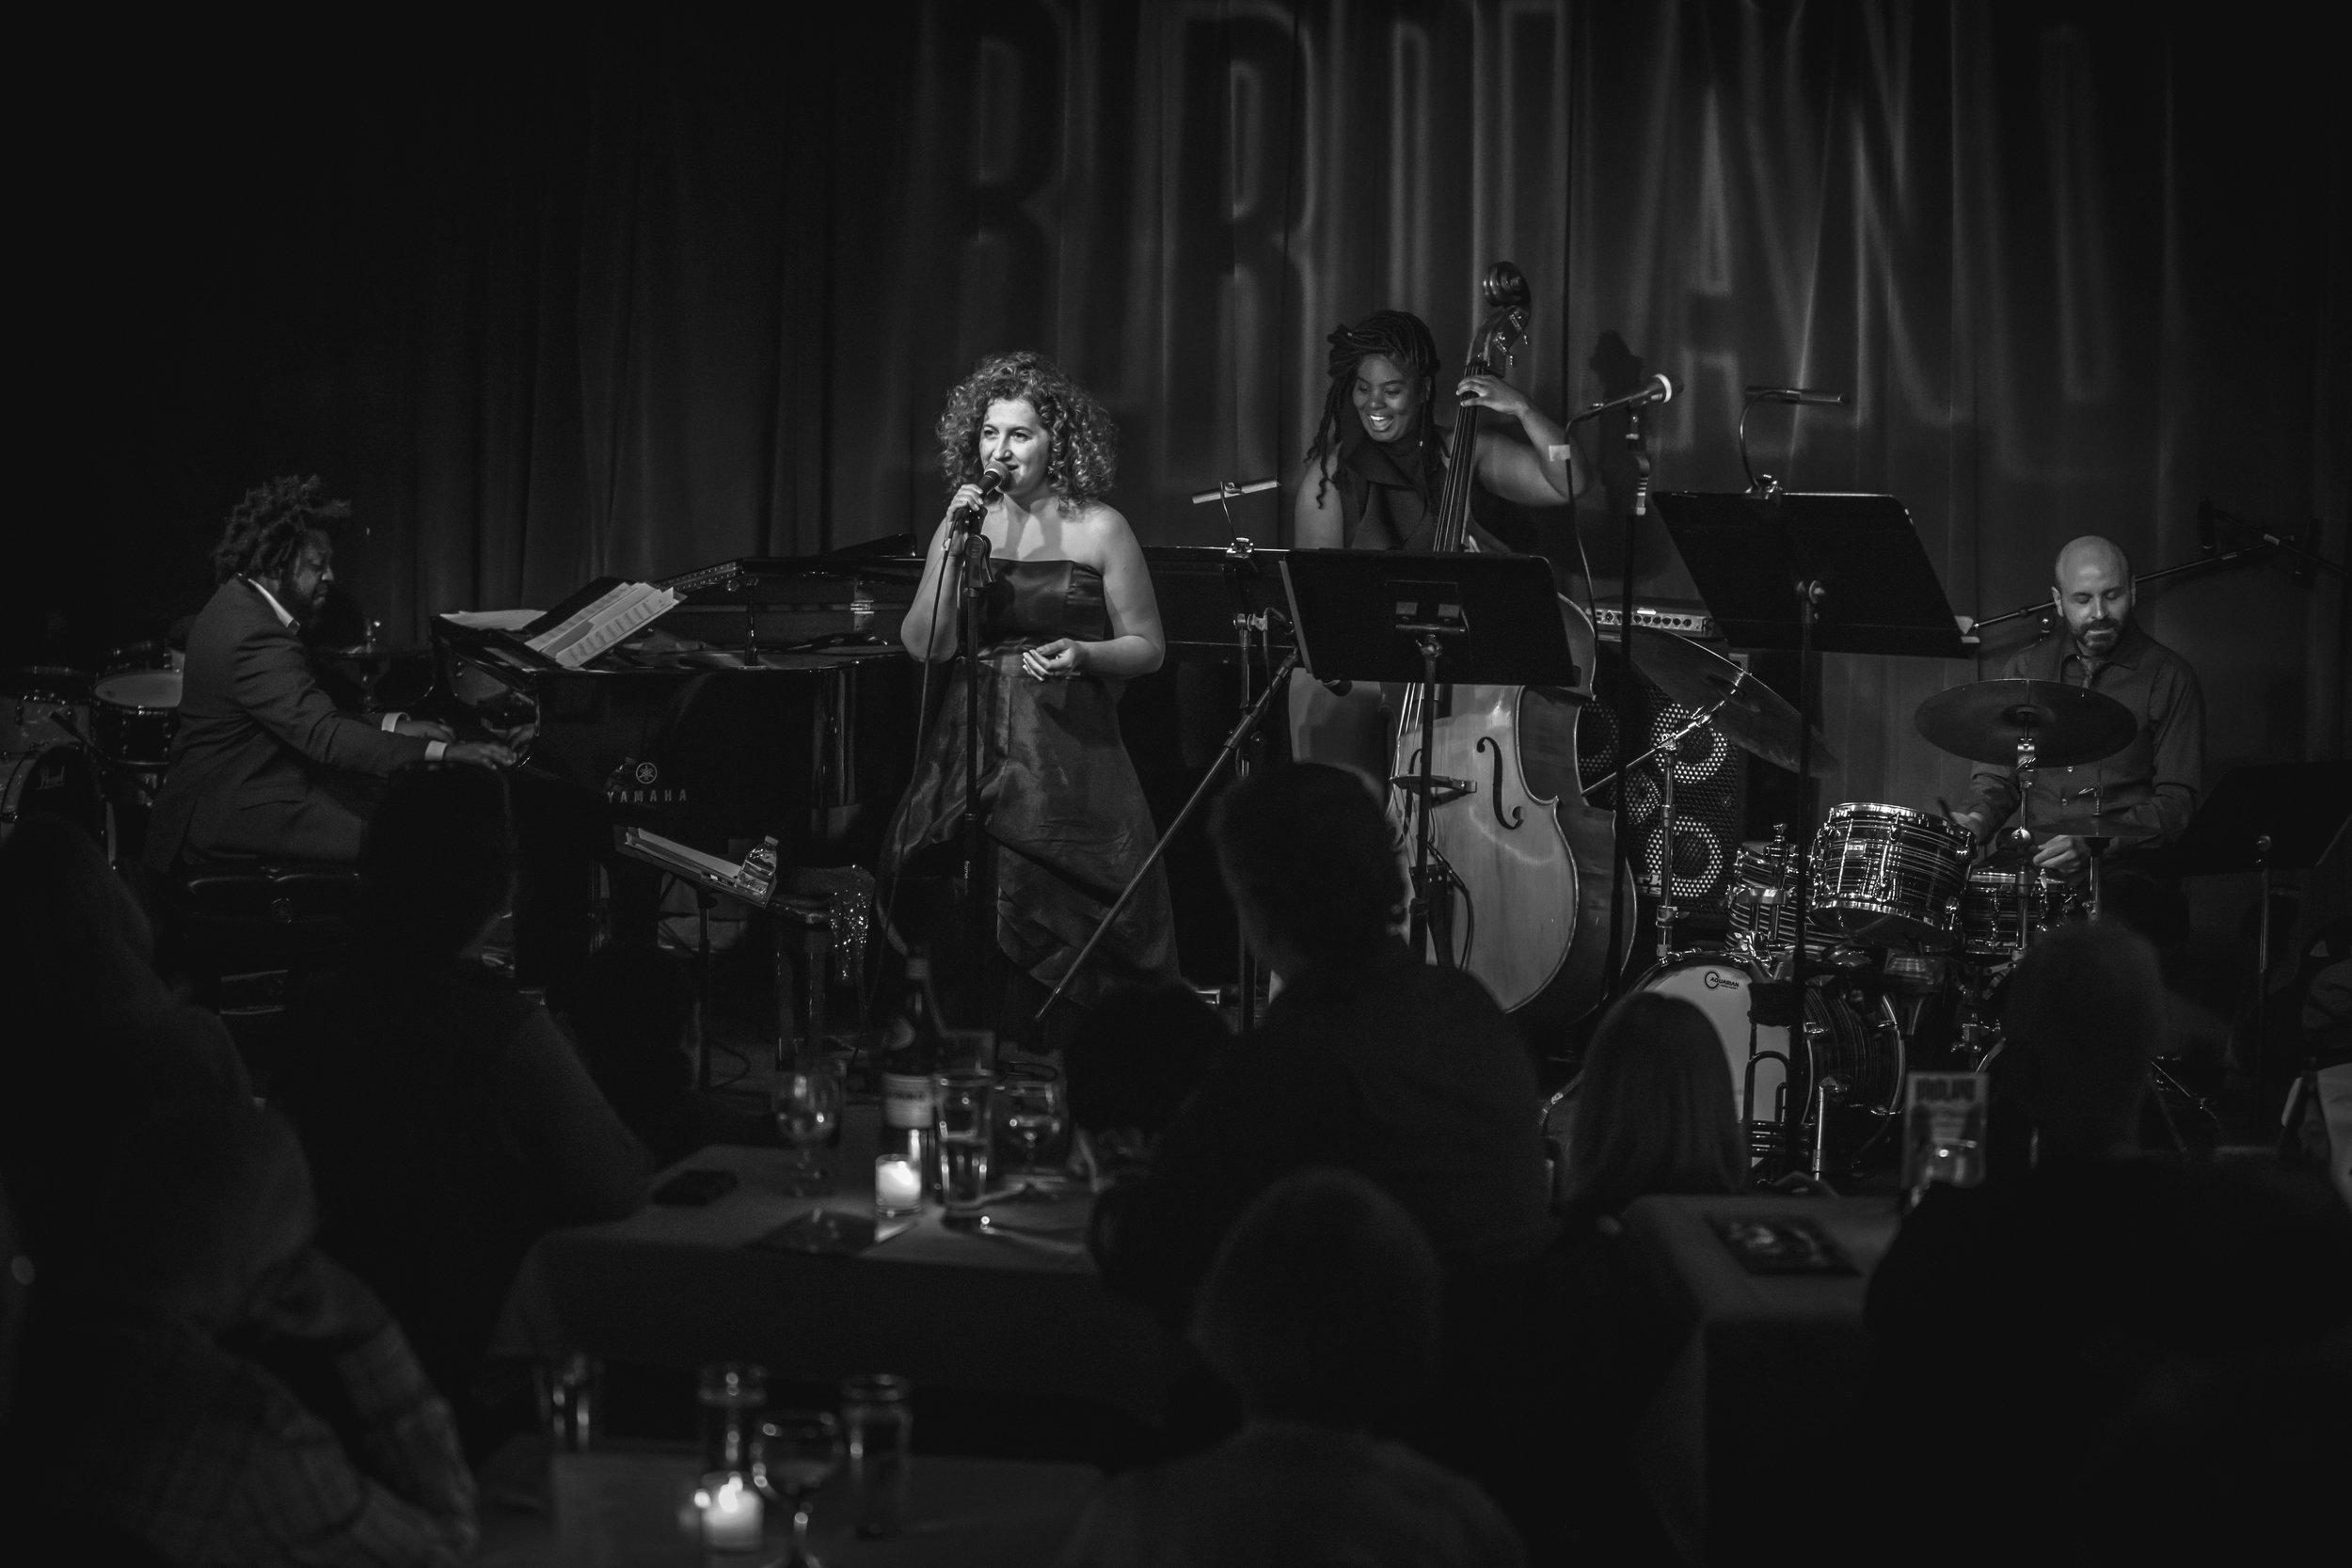 Birdland Jazz Club, June 2018